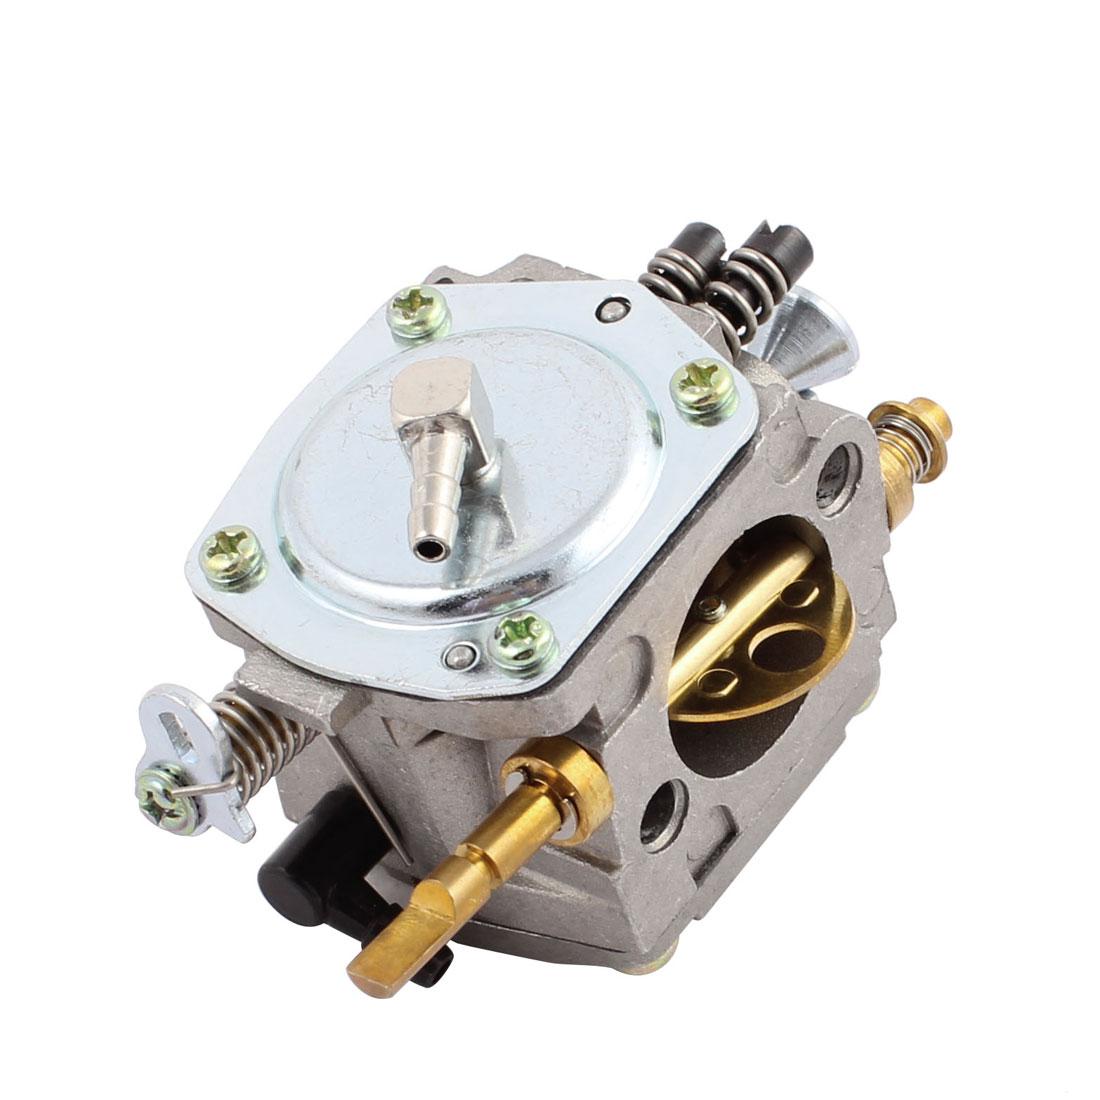 New Carburetor for STIHL Chainsaw Parts Lawn Mower TS-400 Carburador Carb